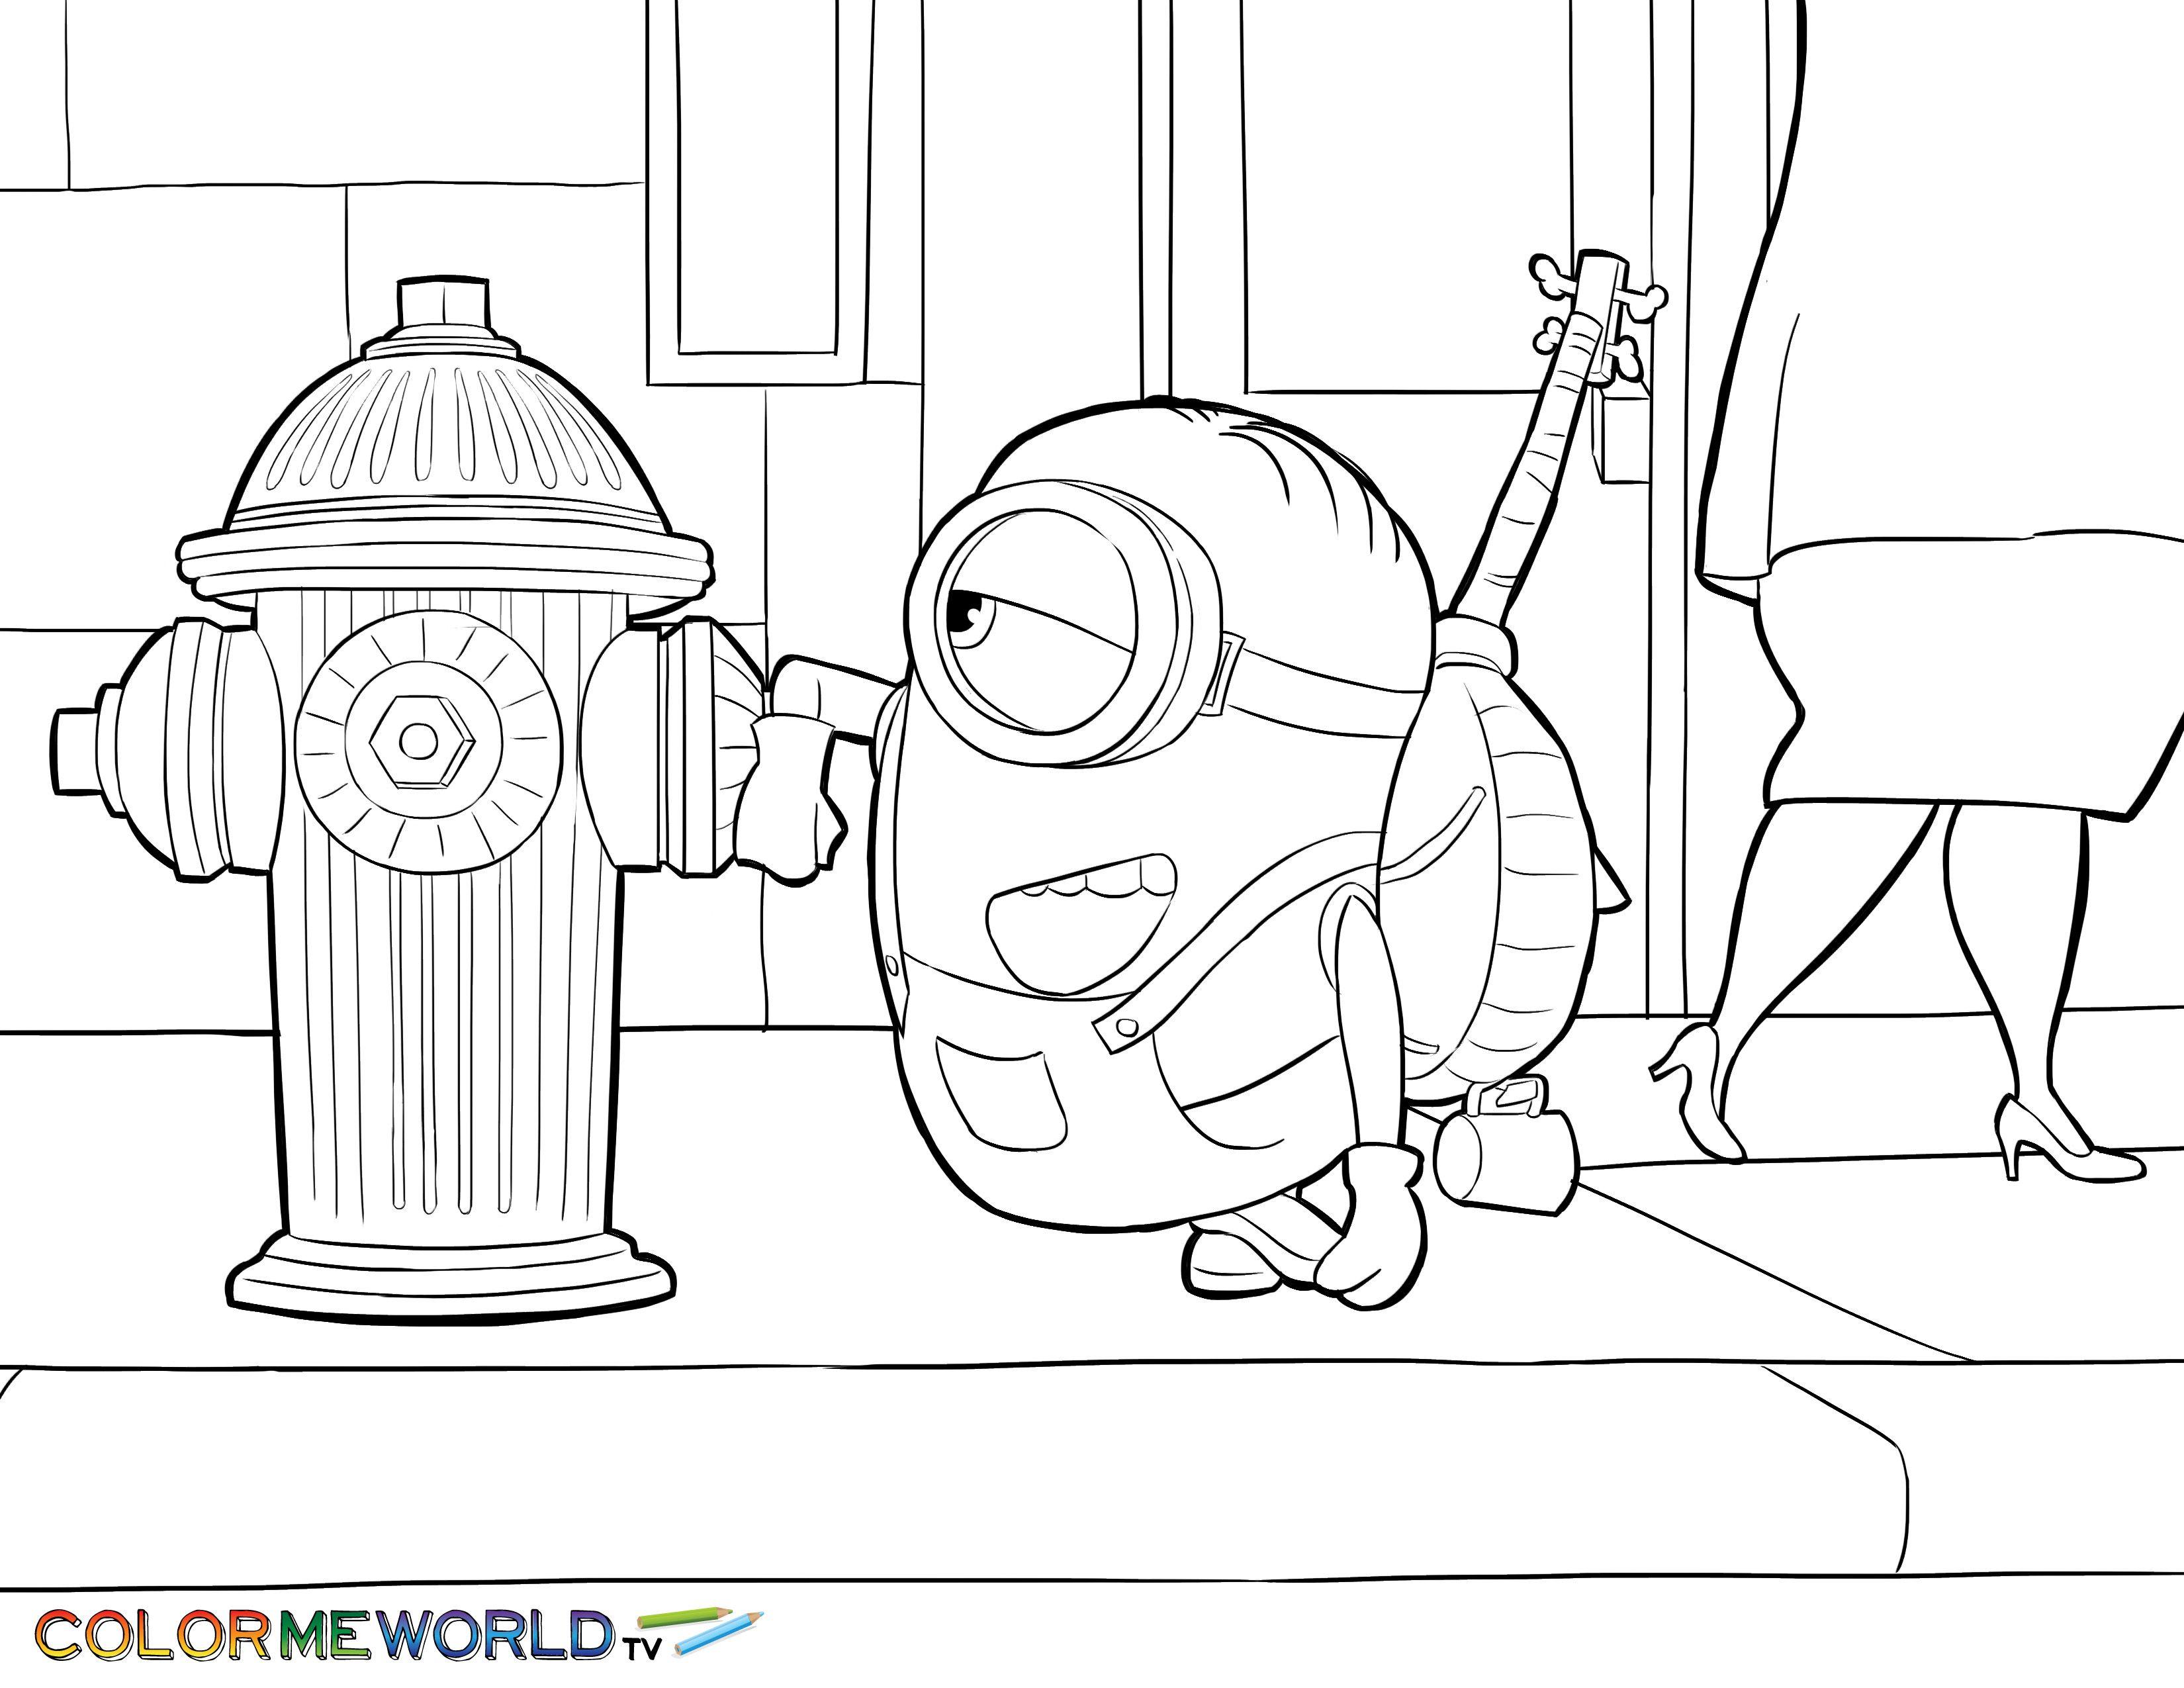 stuart with fire hydrant pdf printable coloring page minions - Fire Hydrant Coloring Page